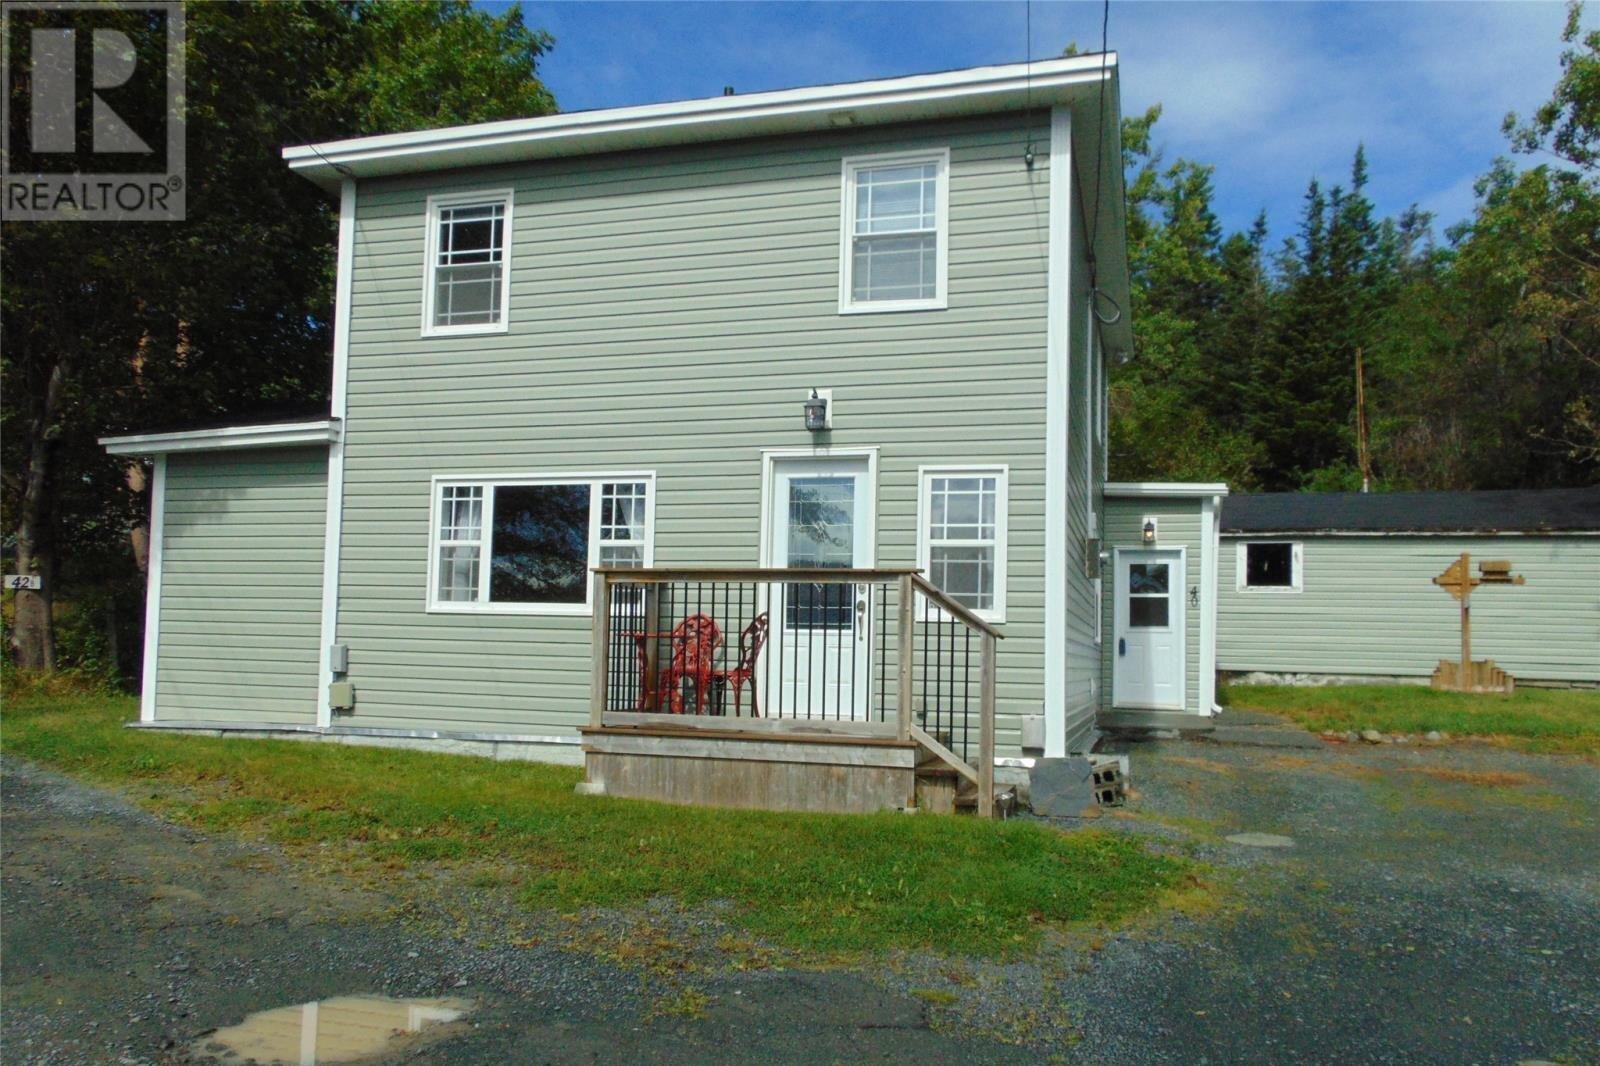 House for sale at 40 Rocky Pond Rd Spaniards Bay Newfoundland - MLS: 1220560